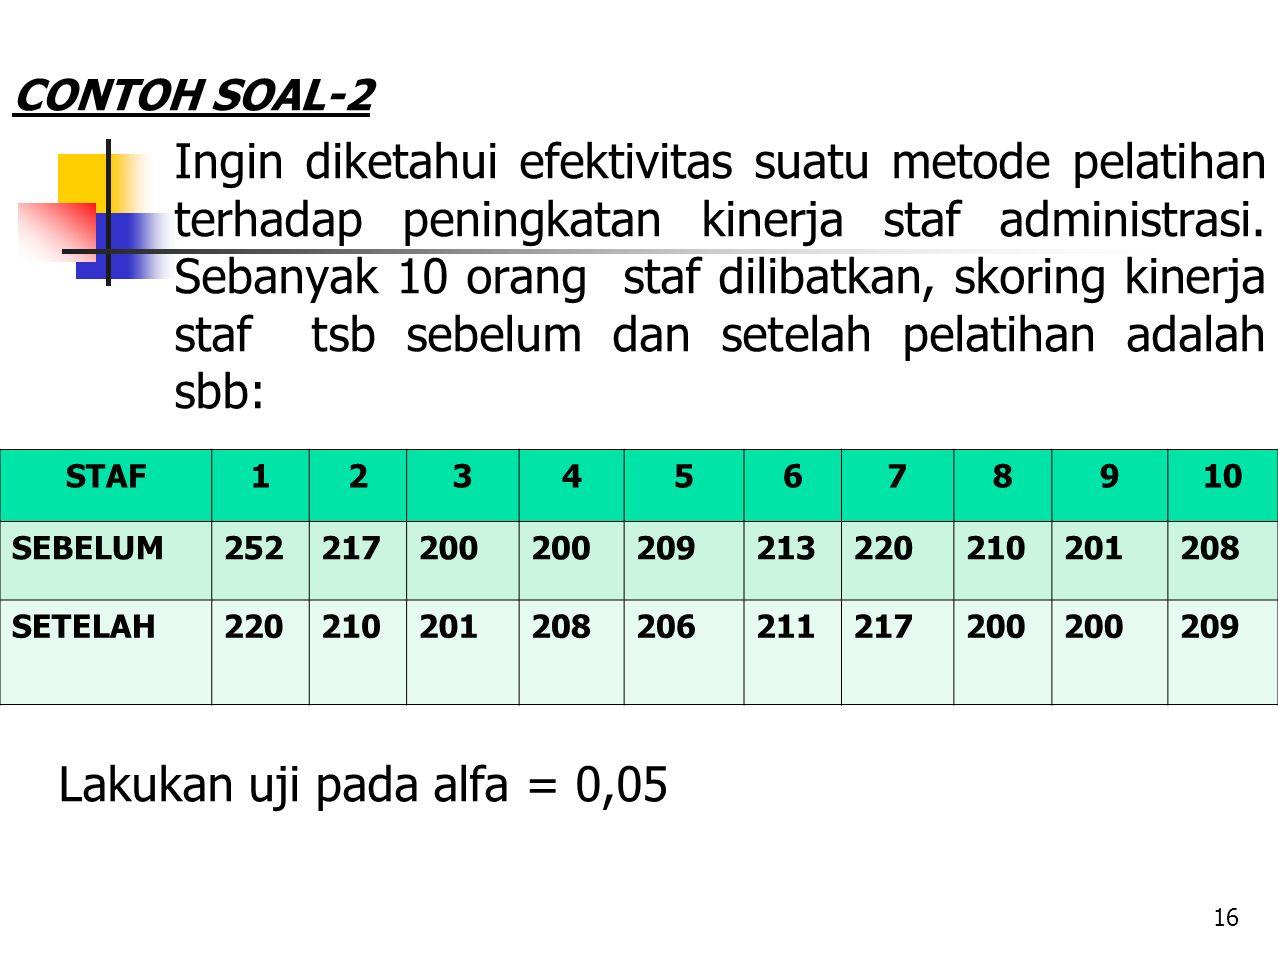 CONTOH SOAL-2